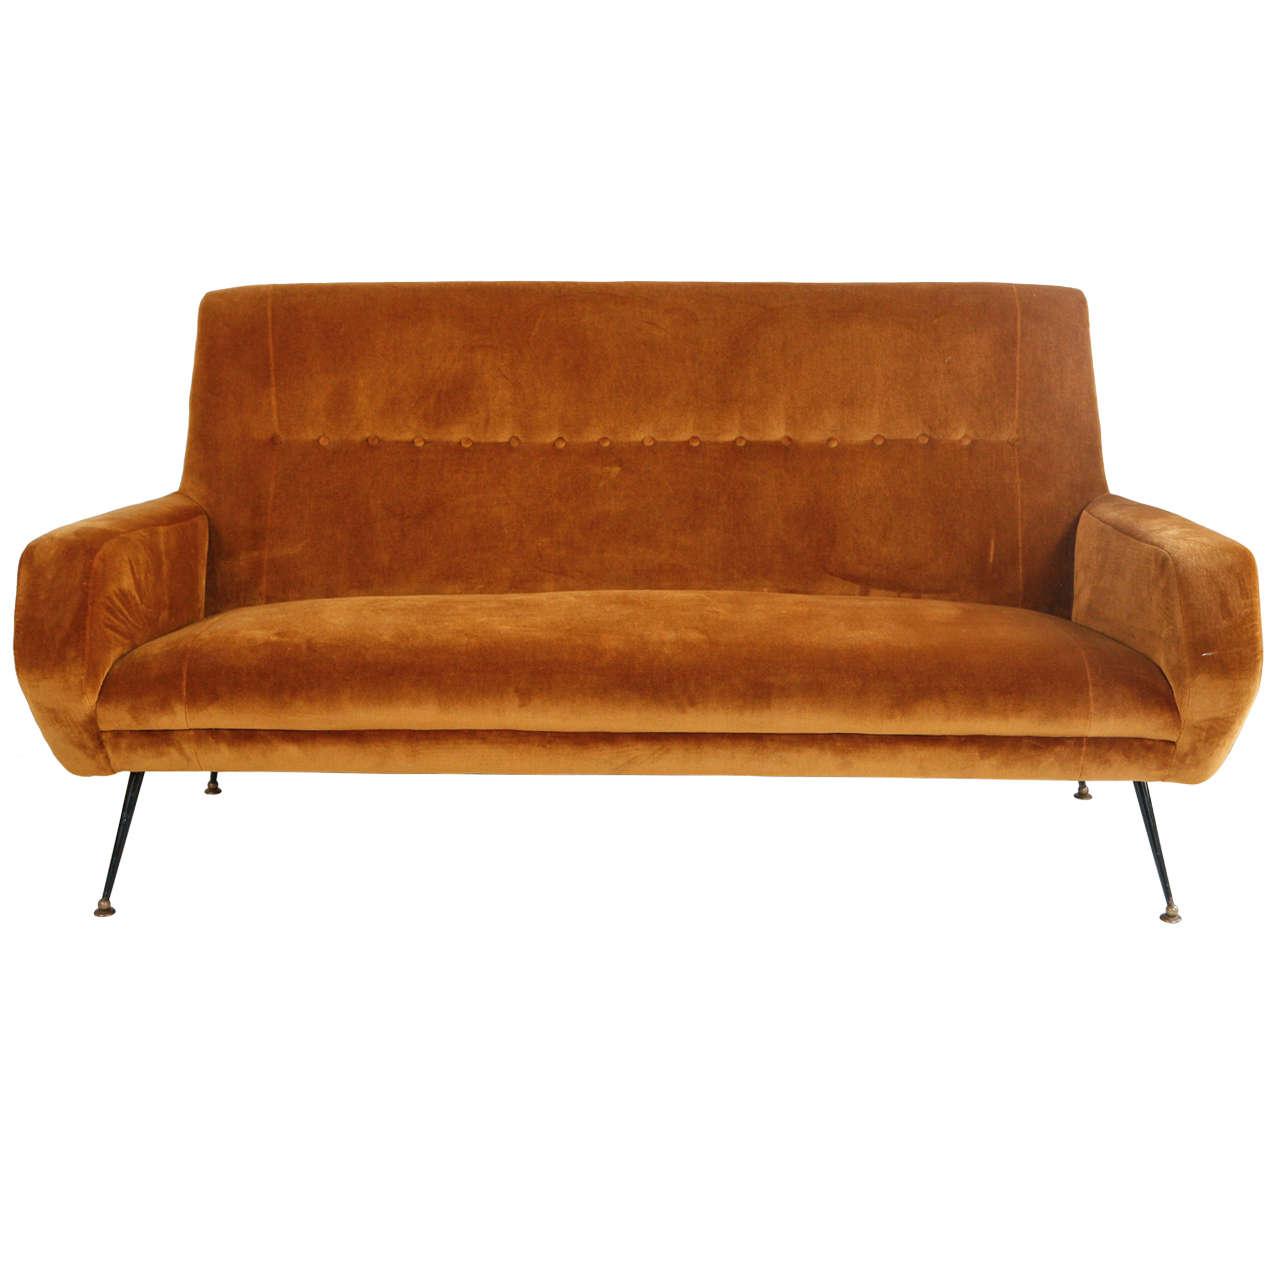 Mid Century Italian Velvet Sofa at 1stdibs : X from www.1stdibs.com size 1280 x 1280 jpeg 67kB